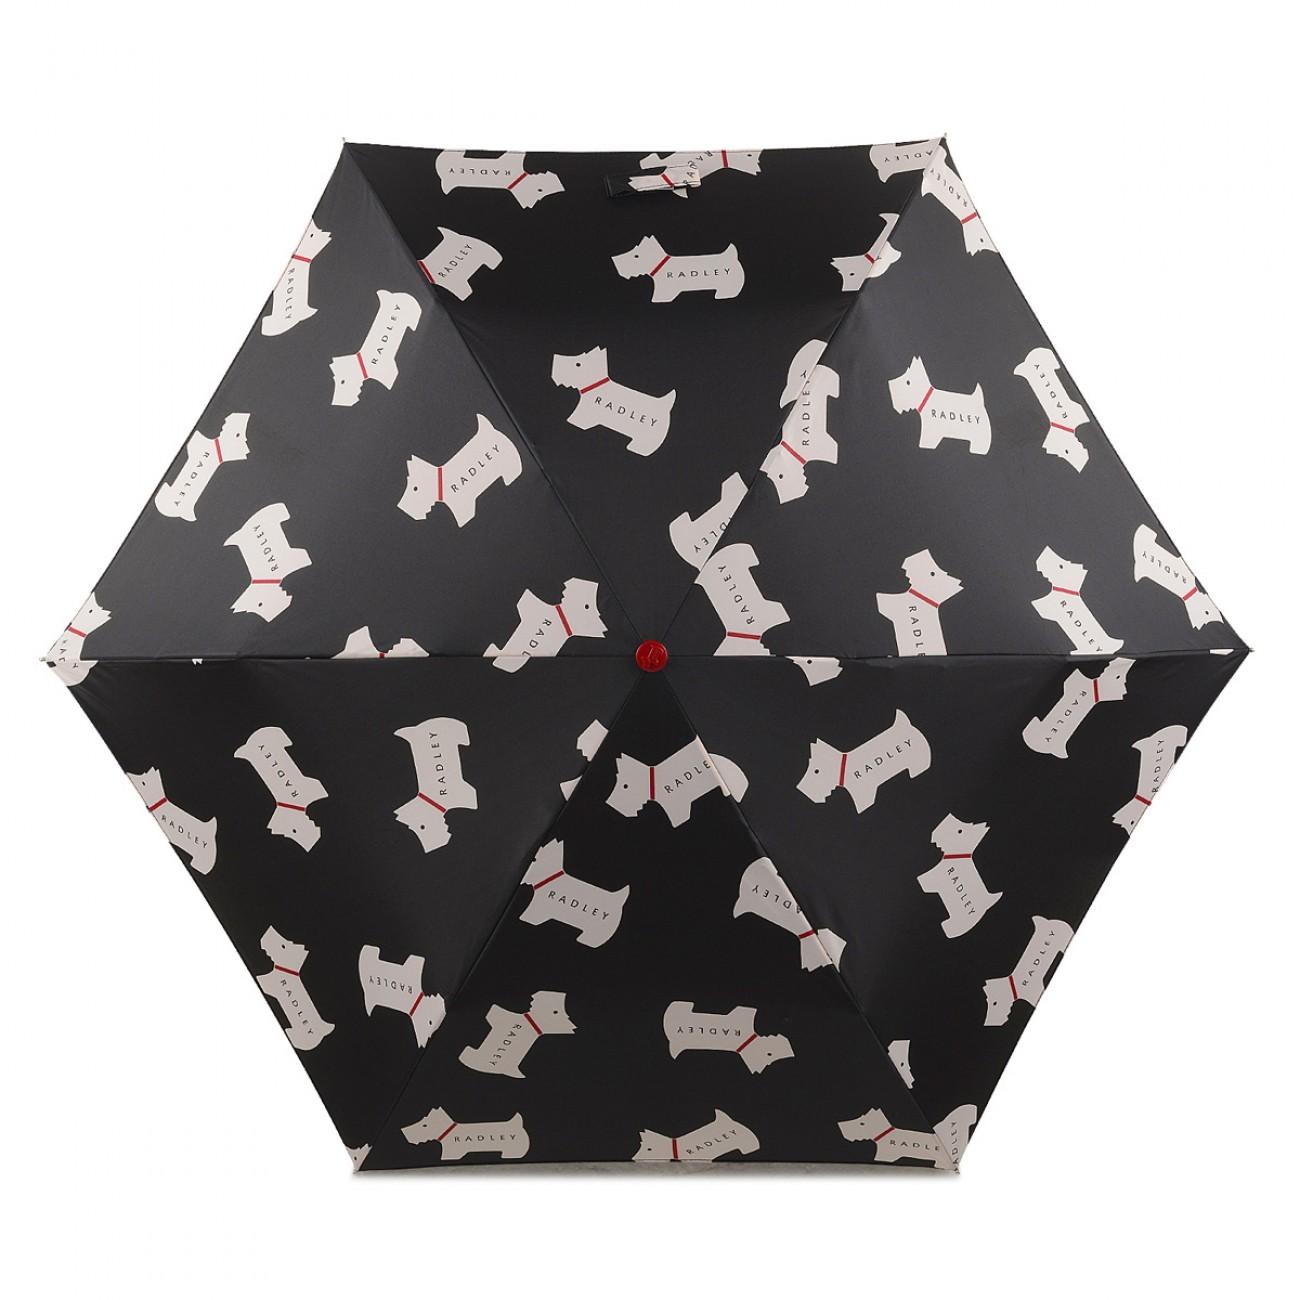 Heritage Radley Umbrella